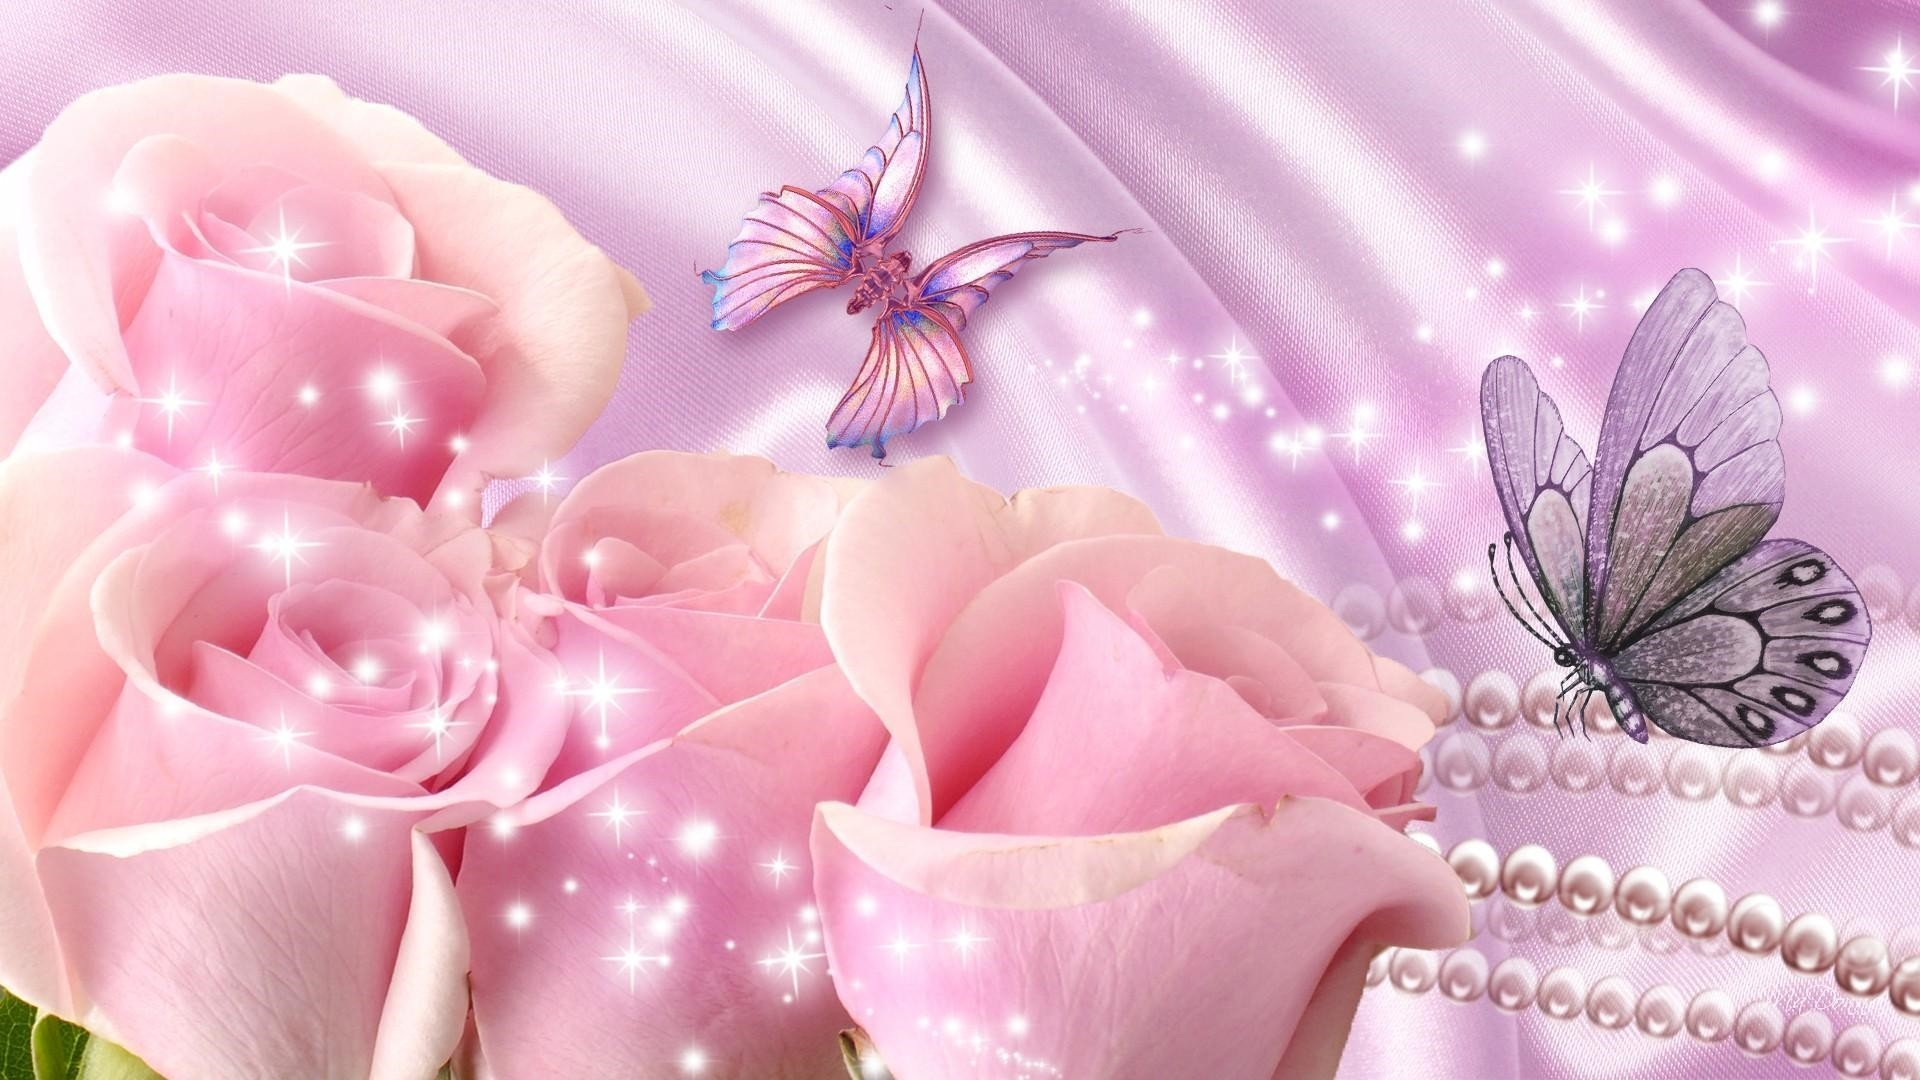 Pink Butterfly Wallpaper image hd